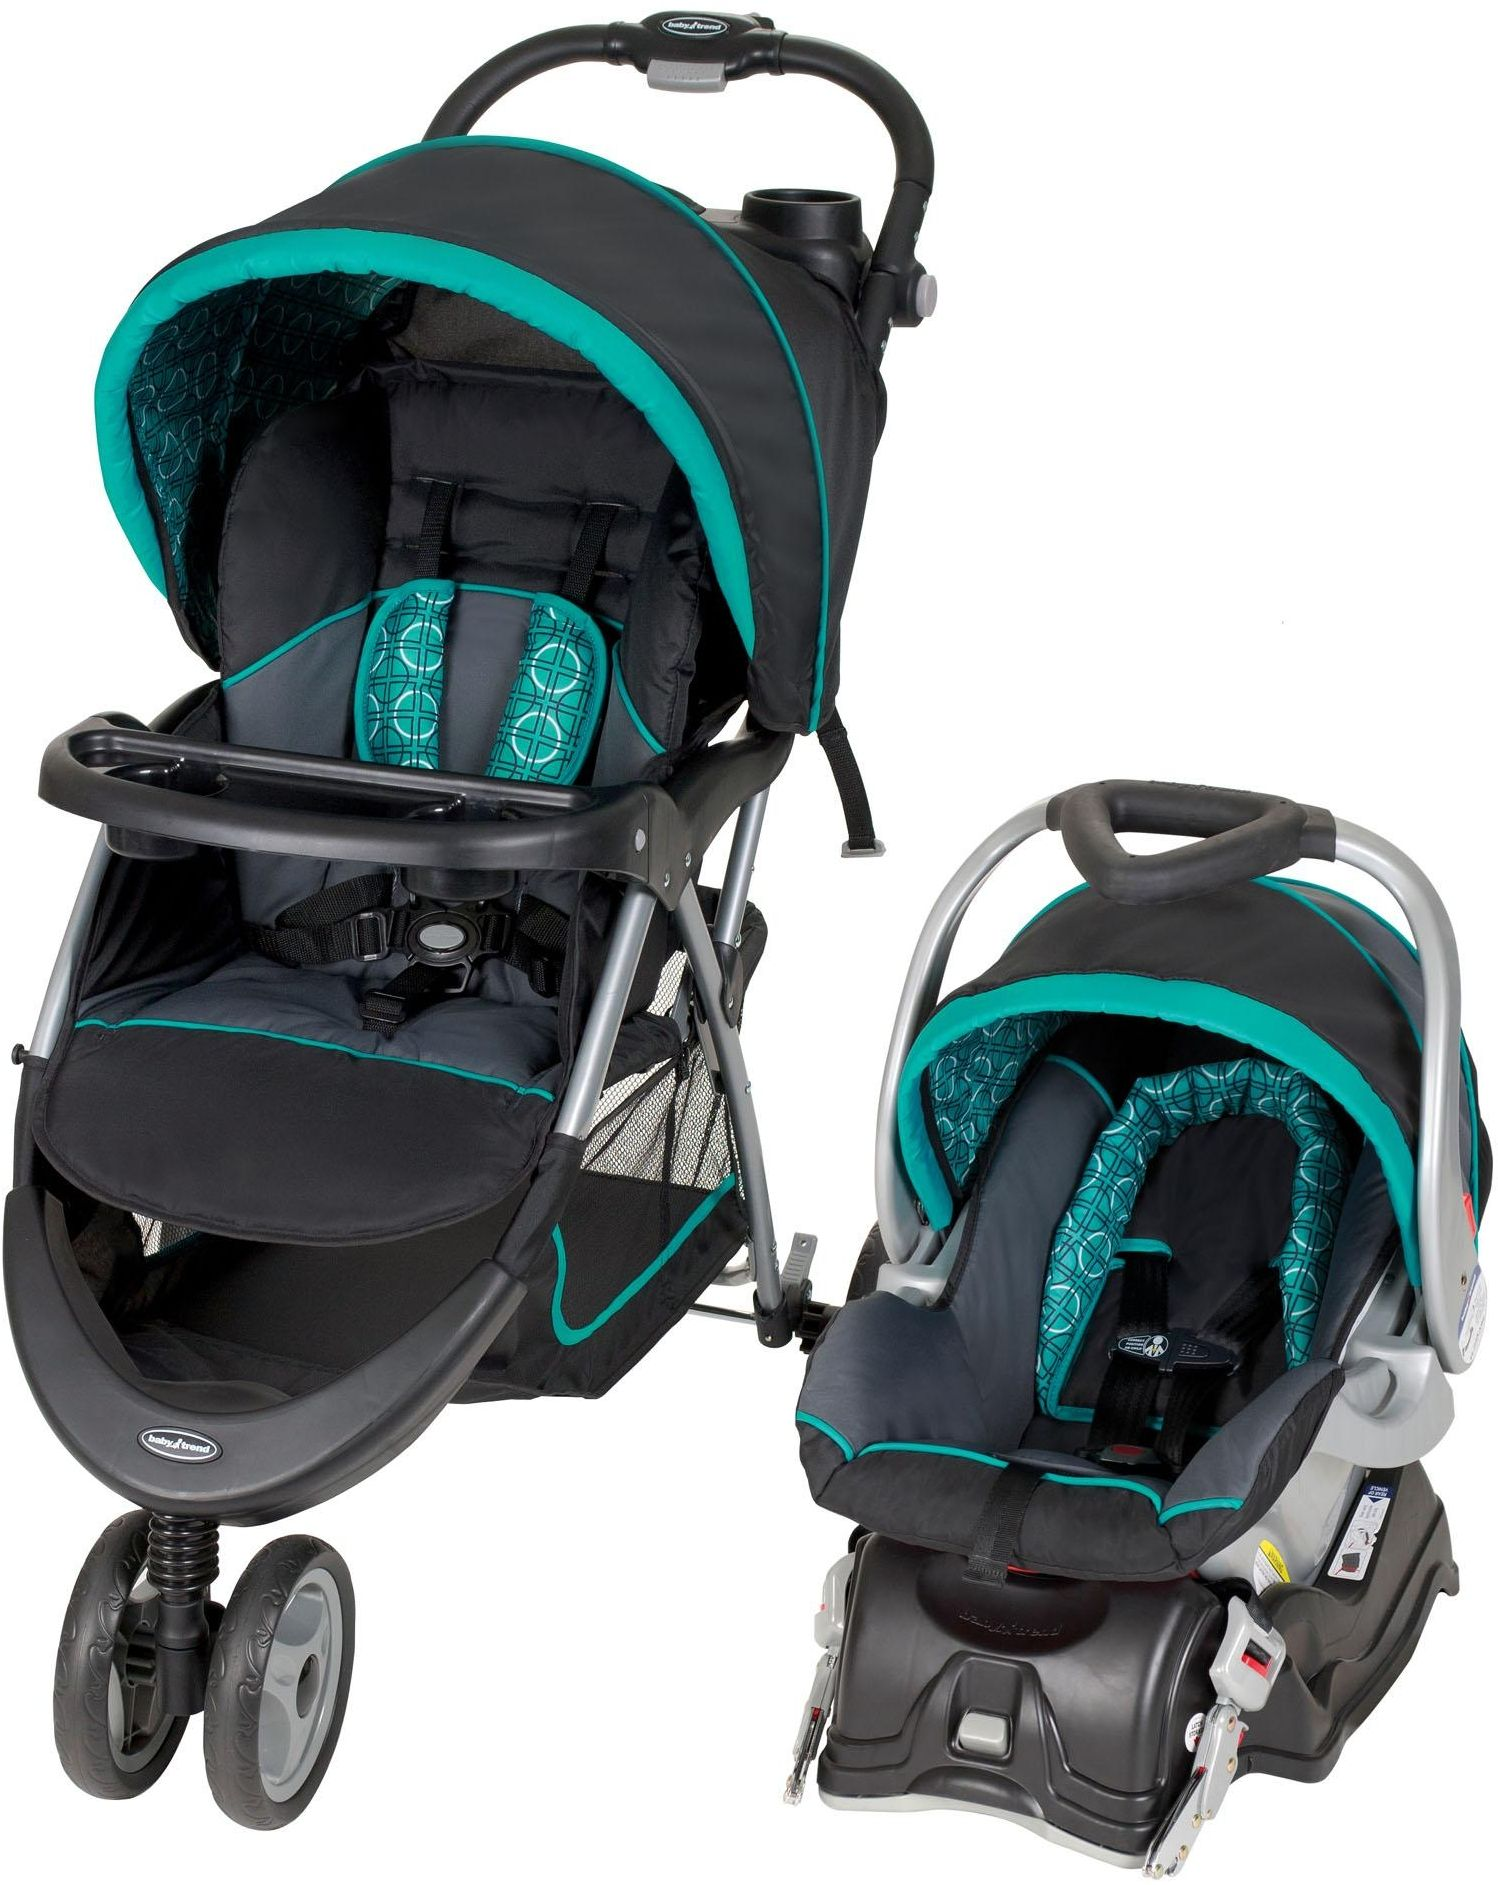 Car Seat Baby Stroller Jogger Combo Baby Tren